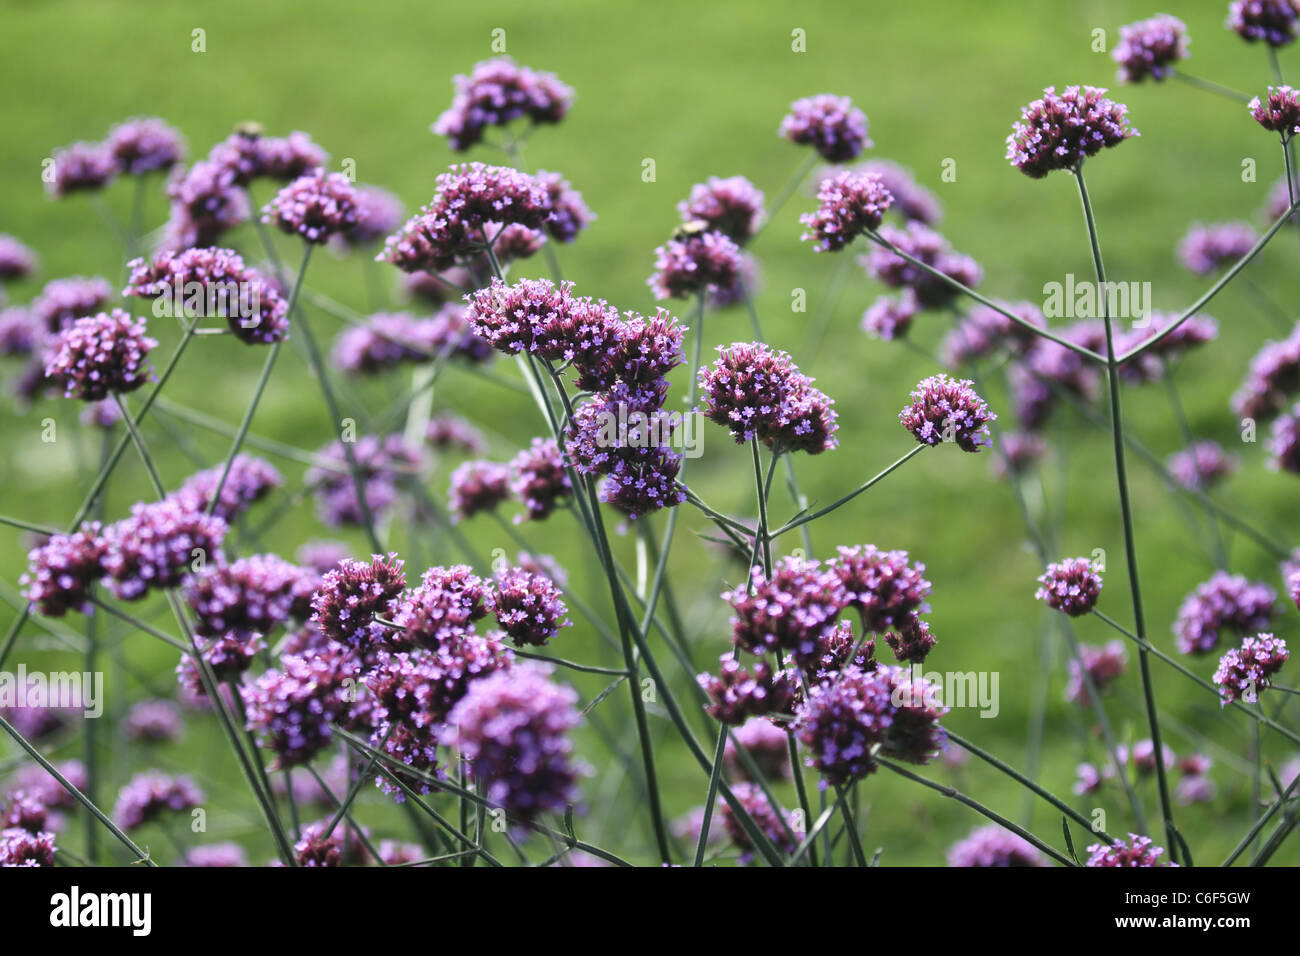 Small purple flowers in a field Stock Photo